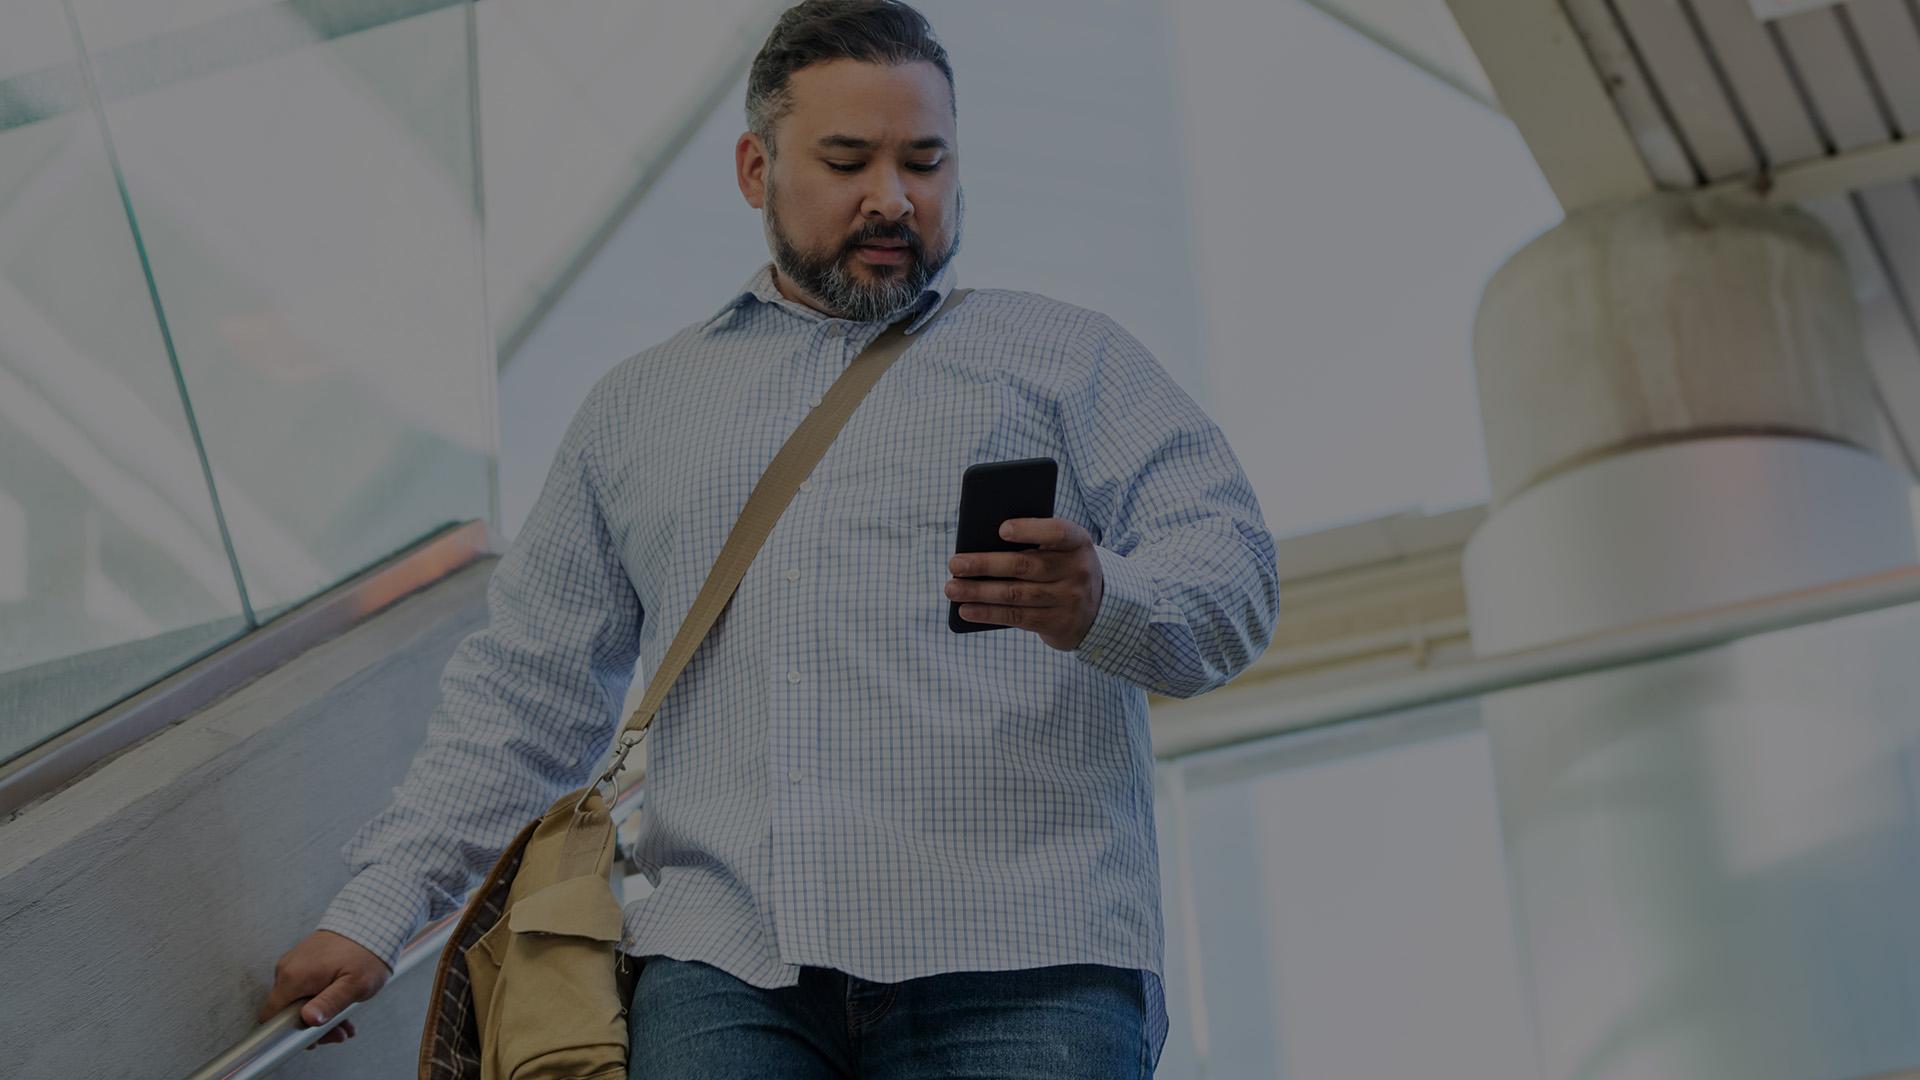 Man on phone pointing at laptop.